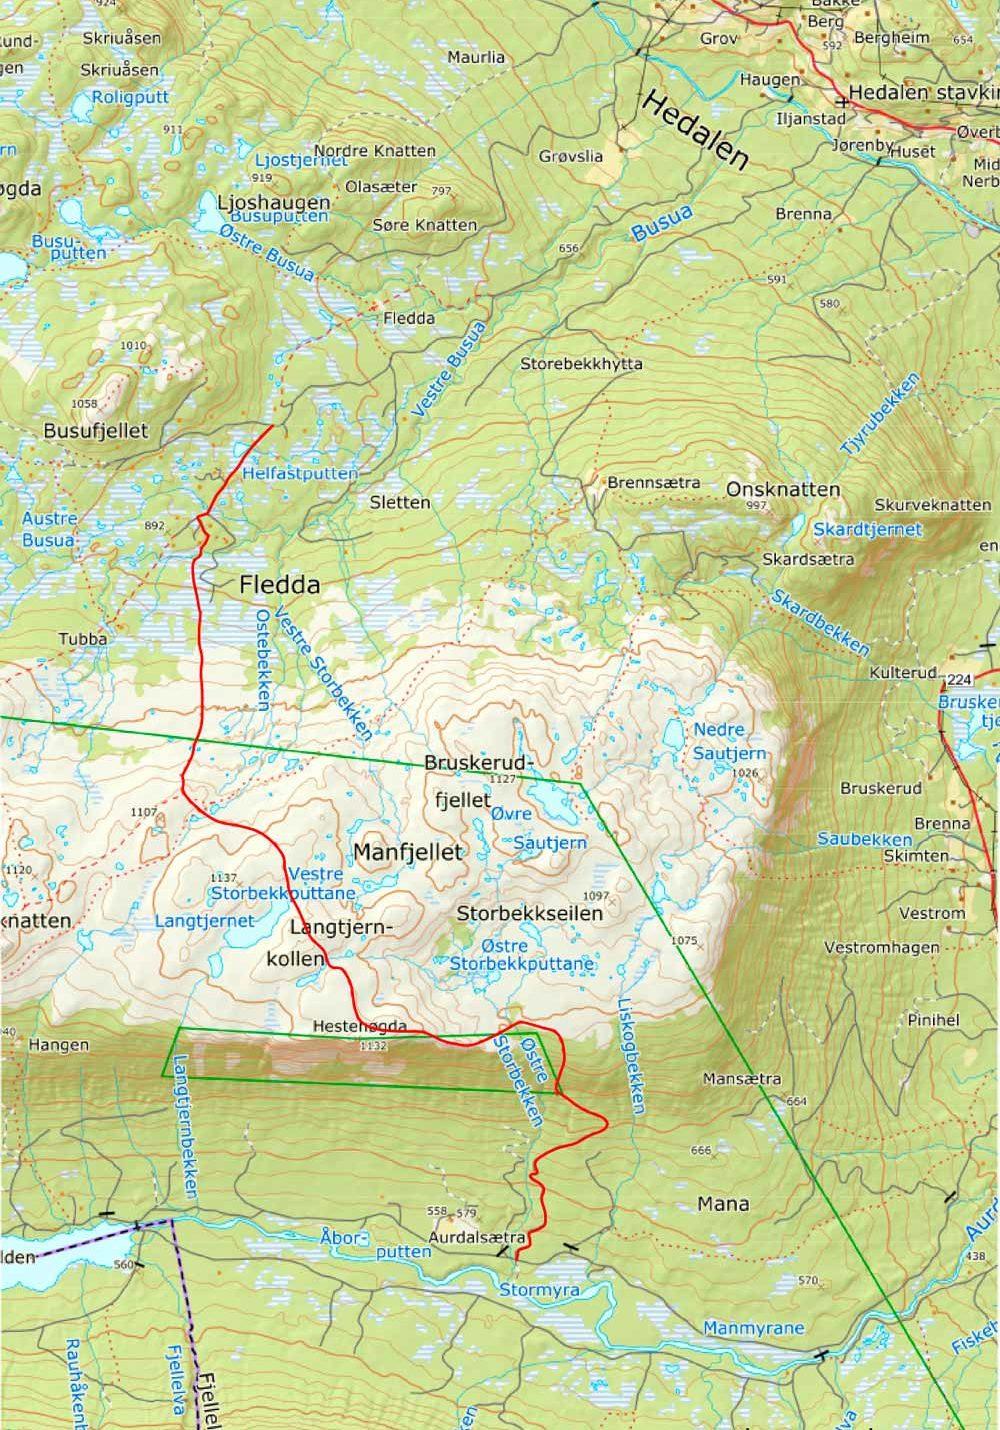 Stien anmerket på kartet